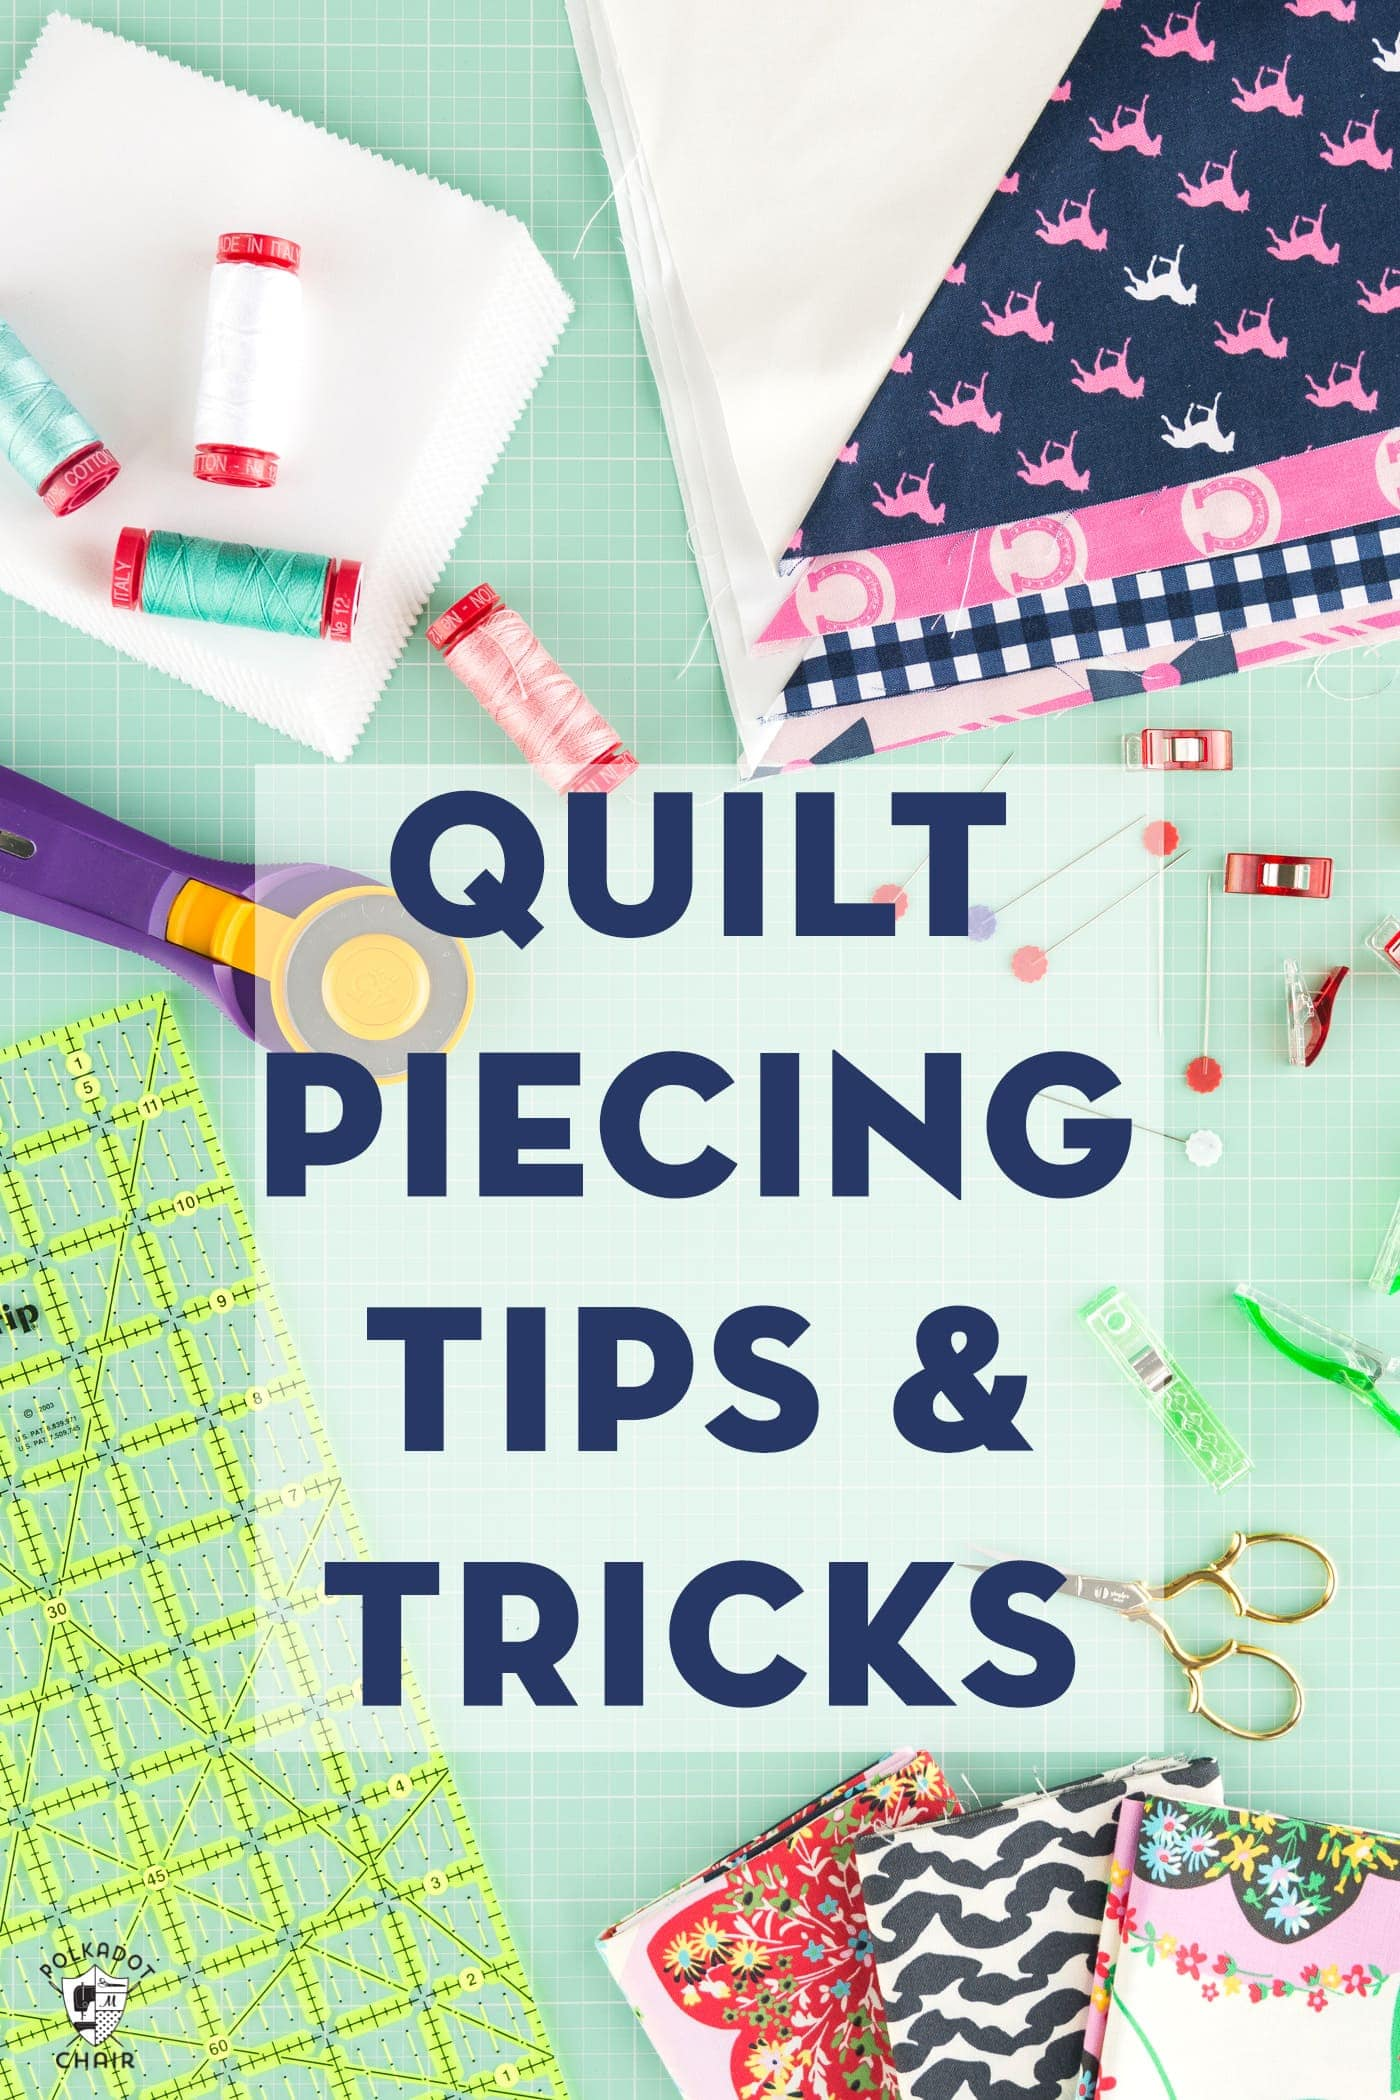 9 Quilt Piecing Tips & Tricks for Halloween Haberdashery Quilt